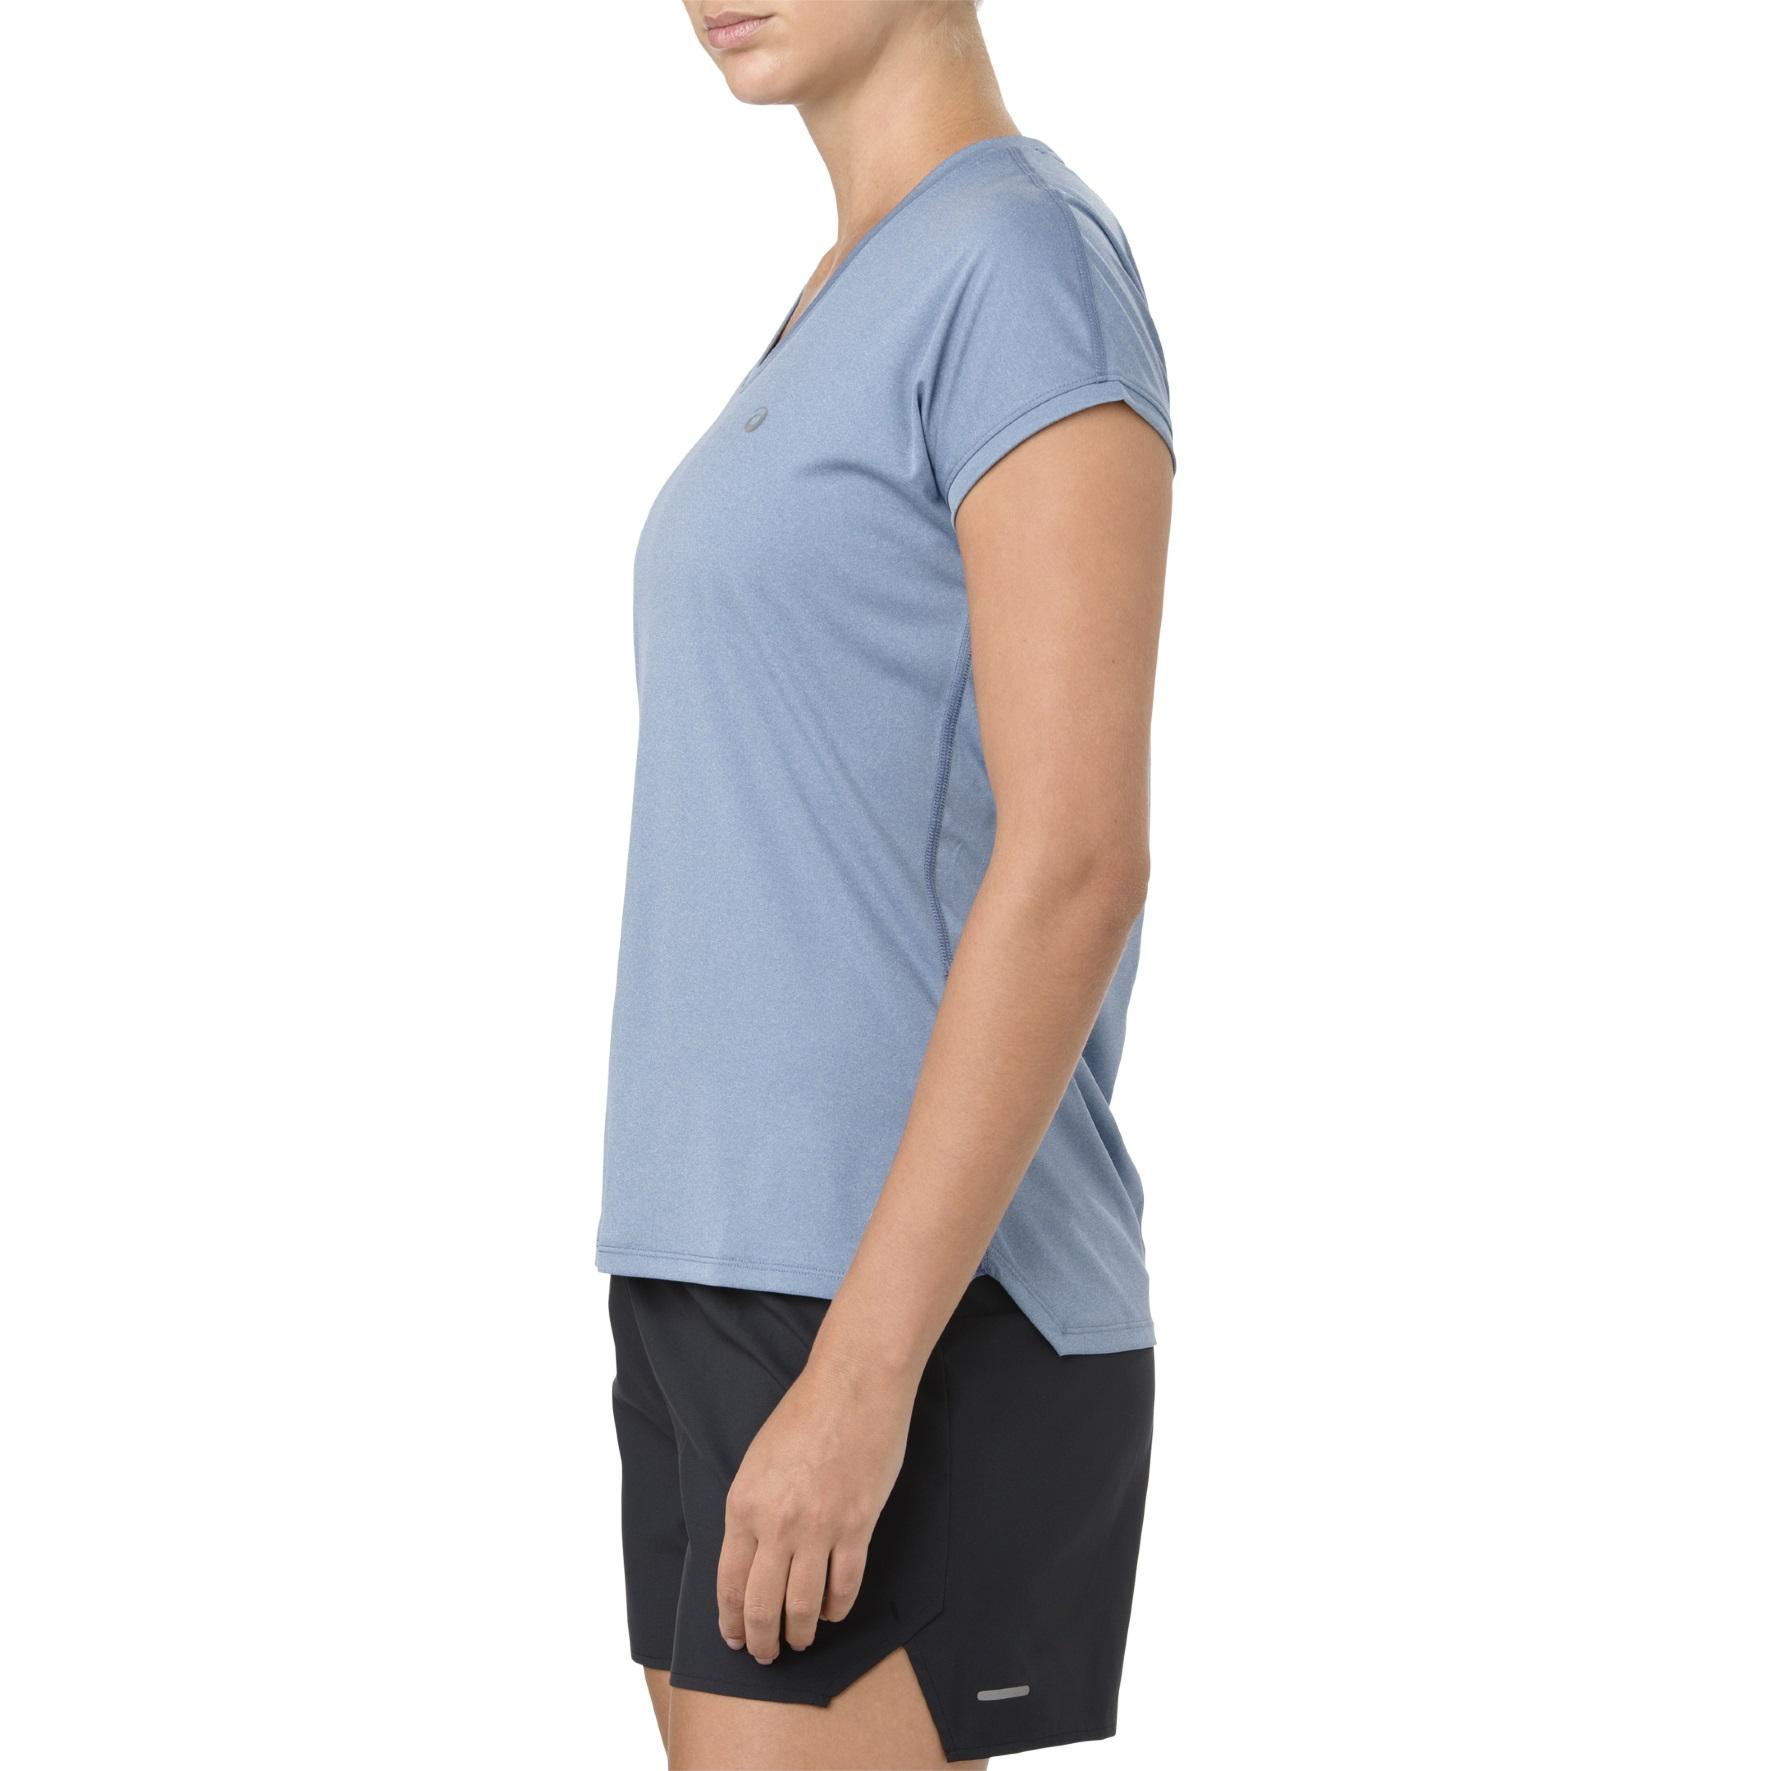 Asics Shirt Capsleeve 2018 blau Damen